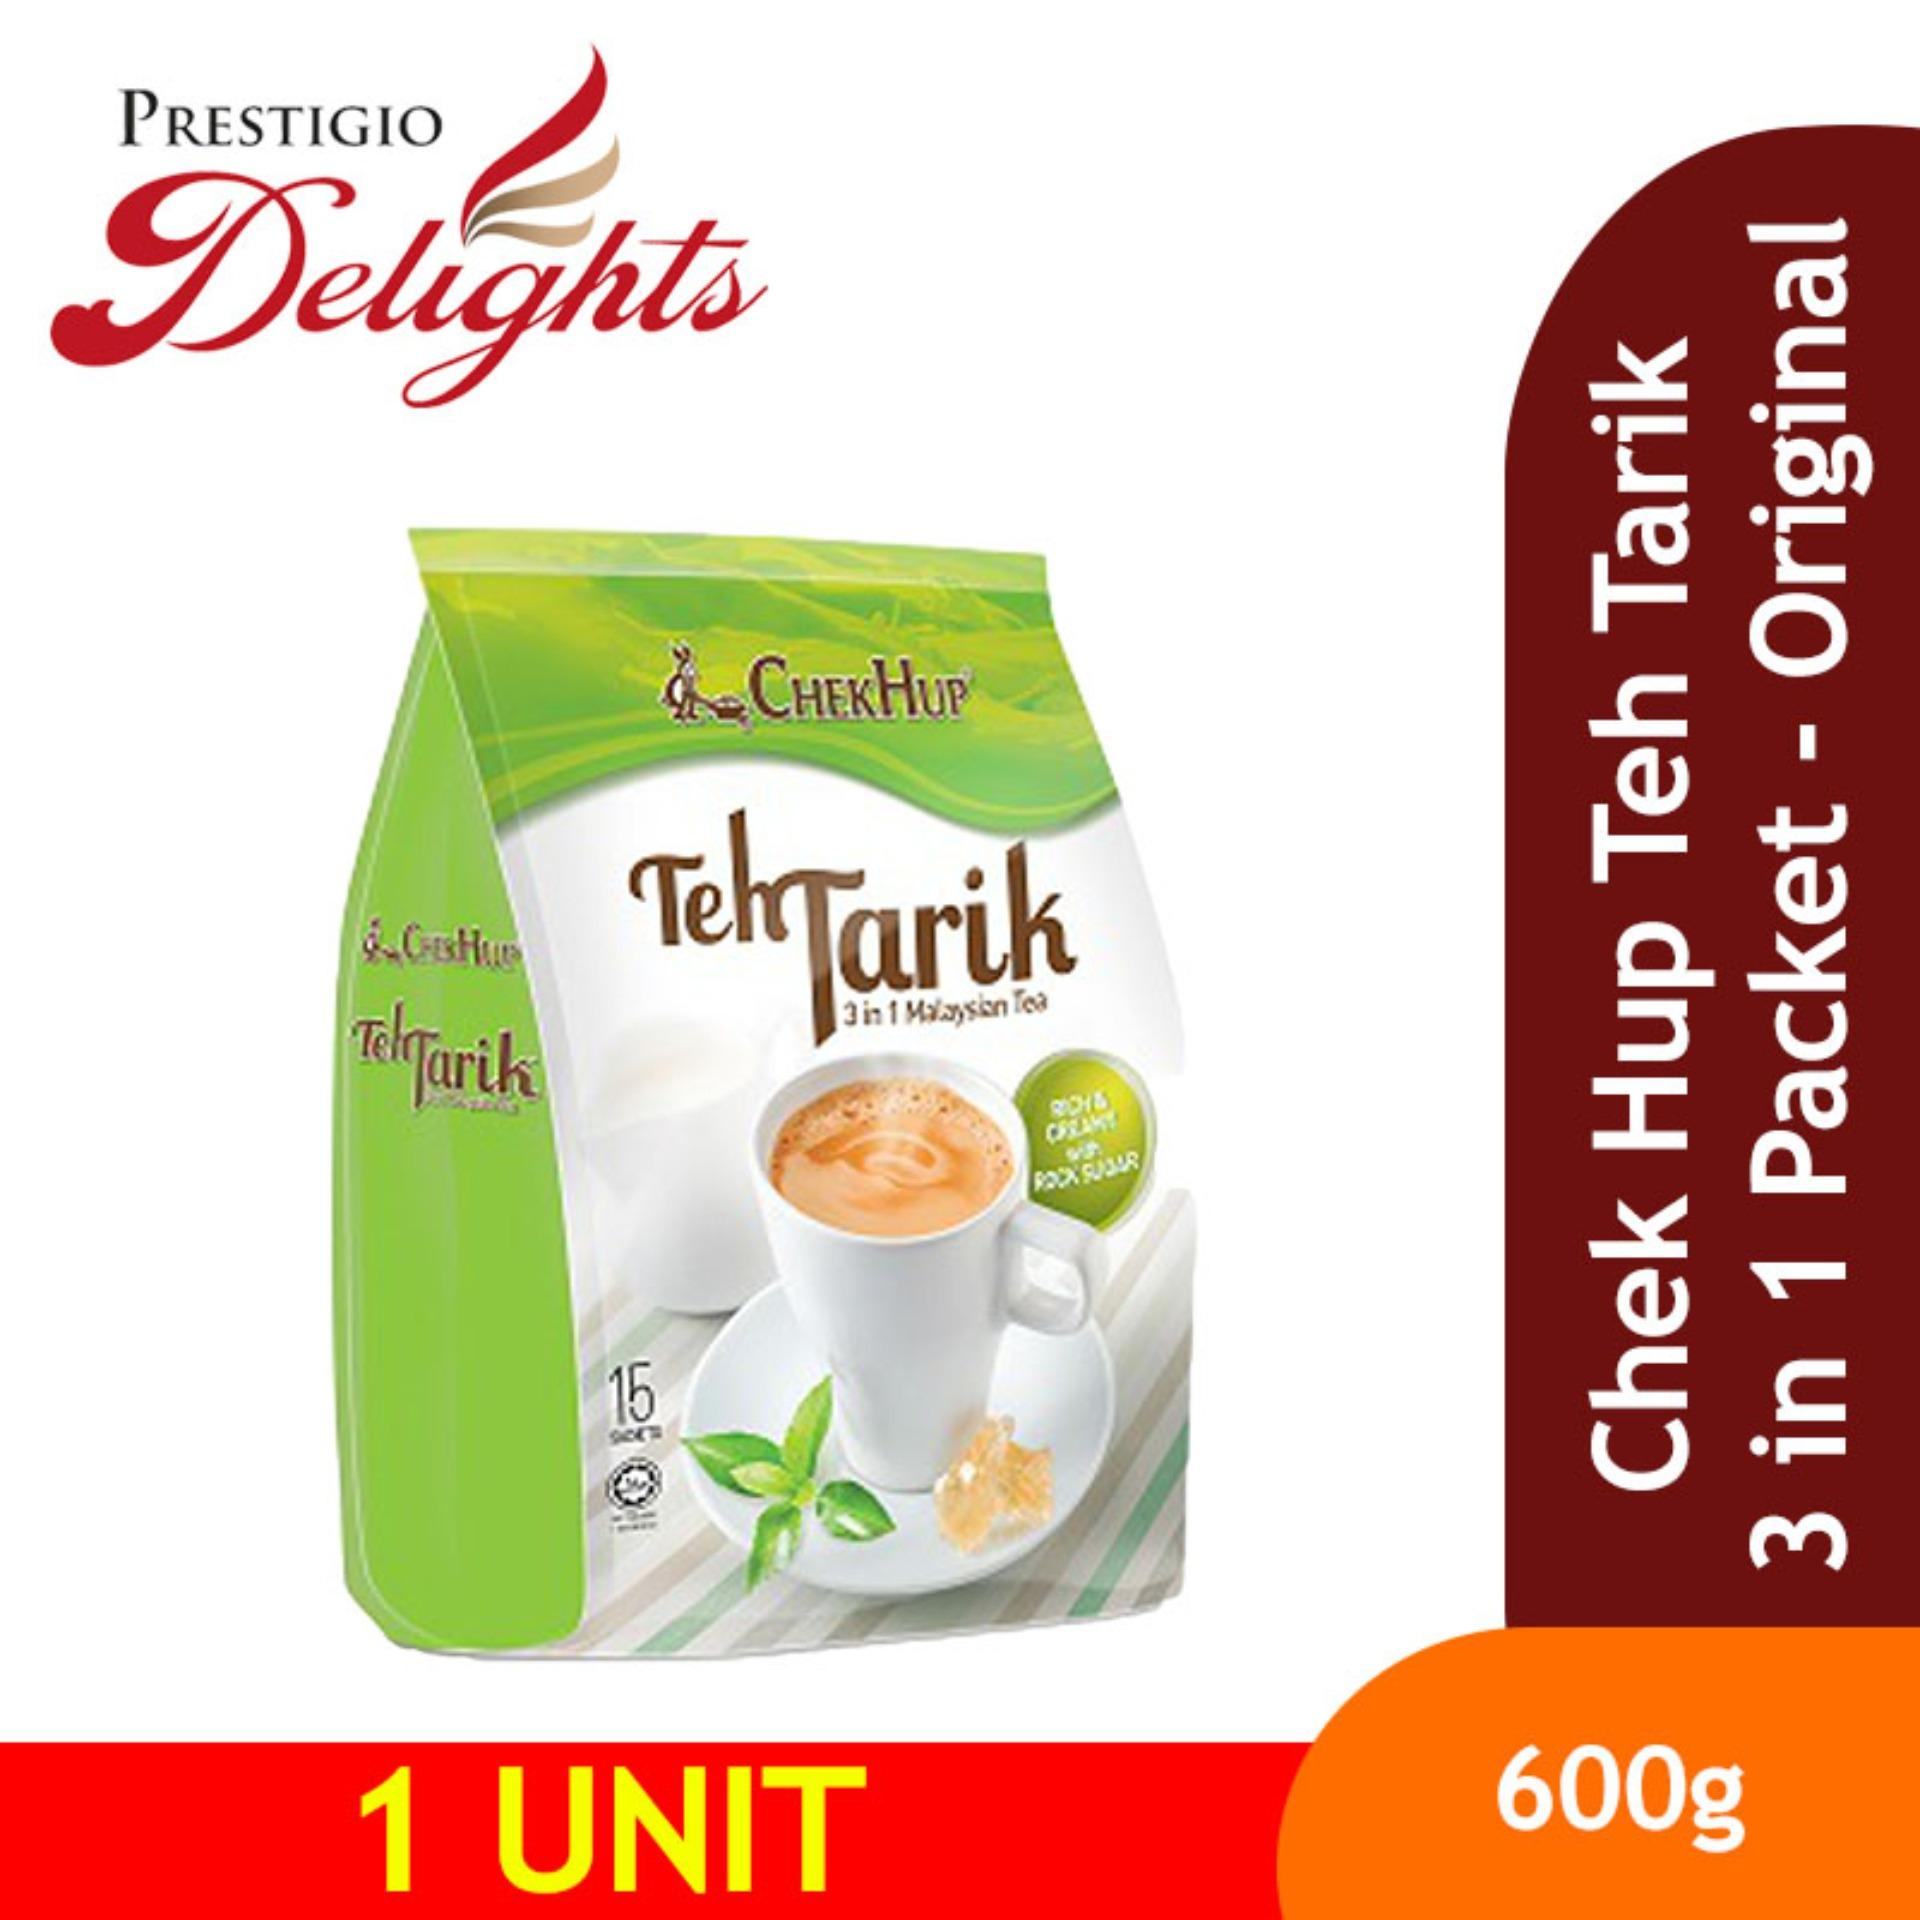 Chek Hup Teh Tarik 3 In 1 Packet - Original By Prestigio Delights.